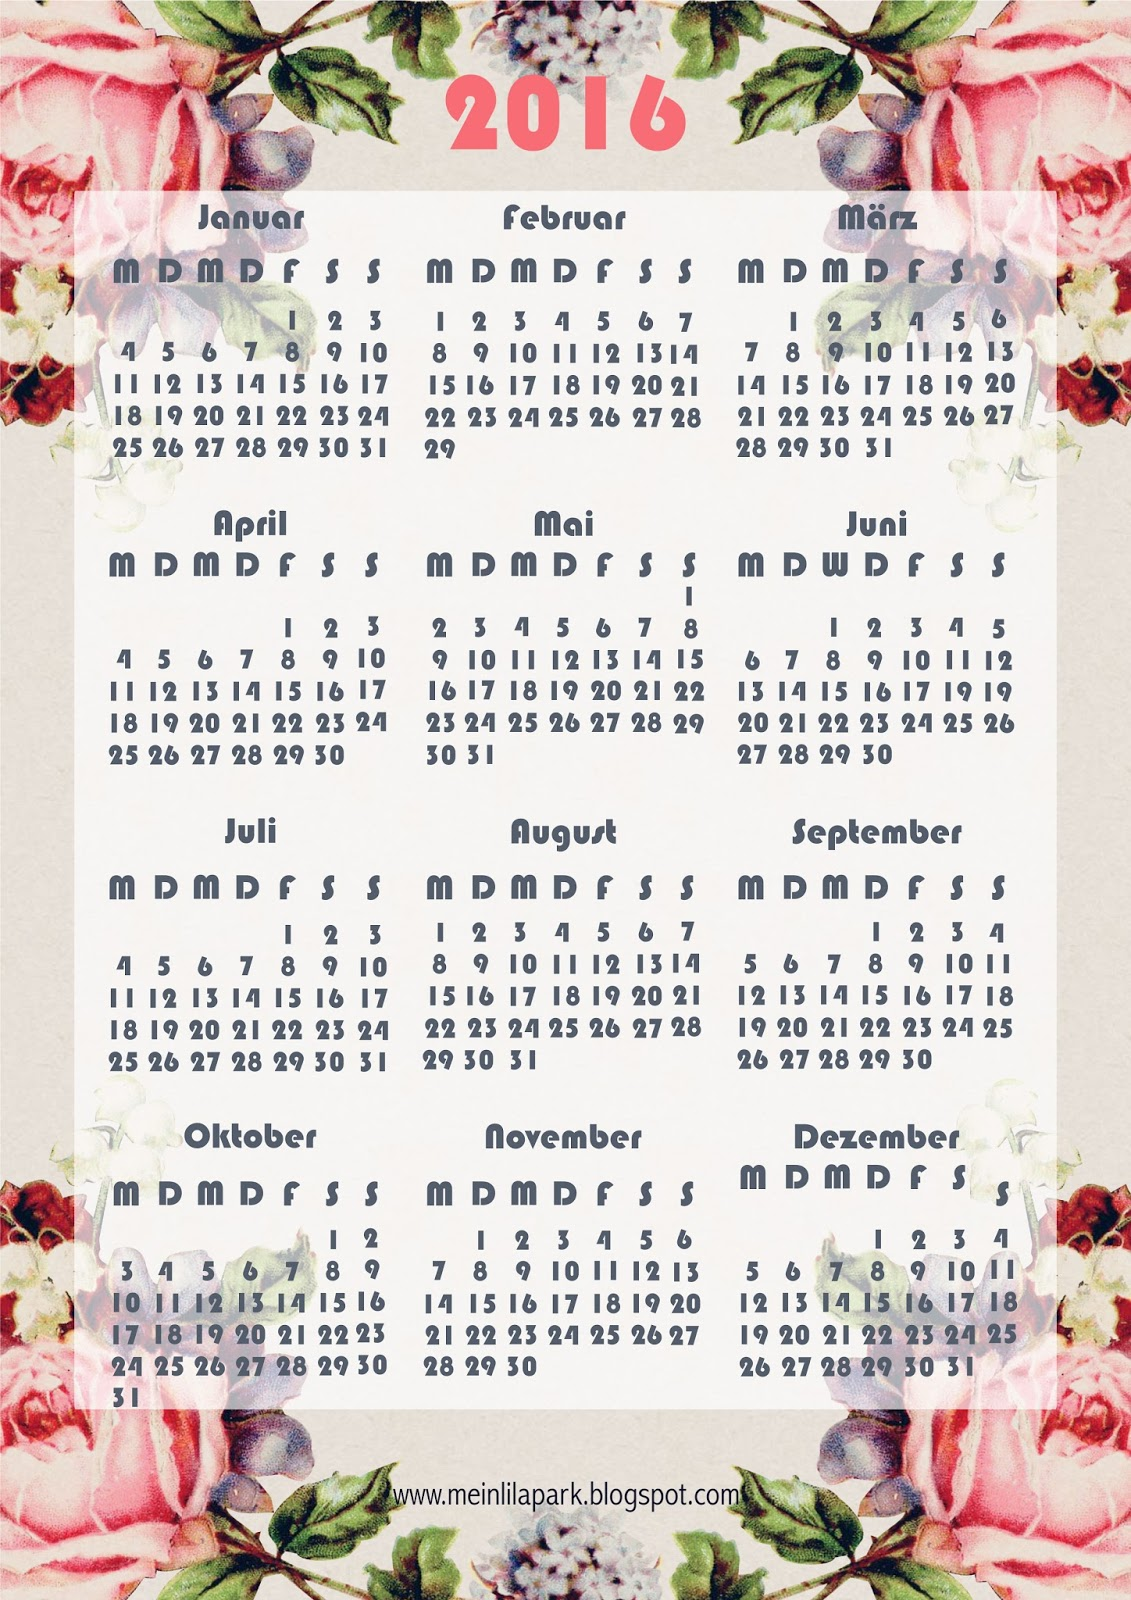 free printable 2016 rose calendar ausdruckbarer kalender 2016 freebie meinlilapark. Black Bedroom Furniture Sets. Home Design Ideas